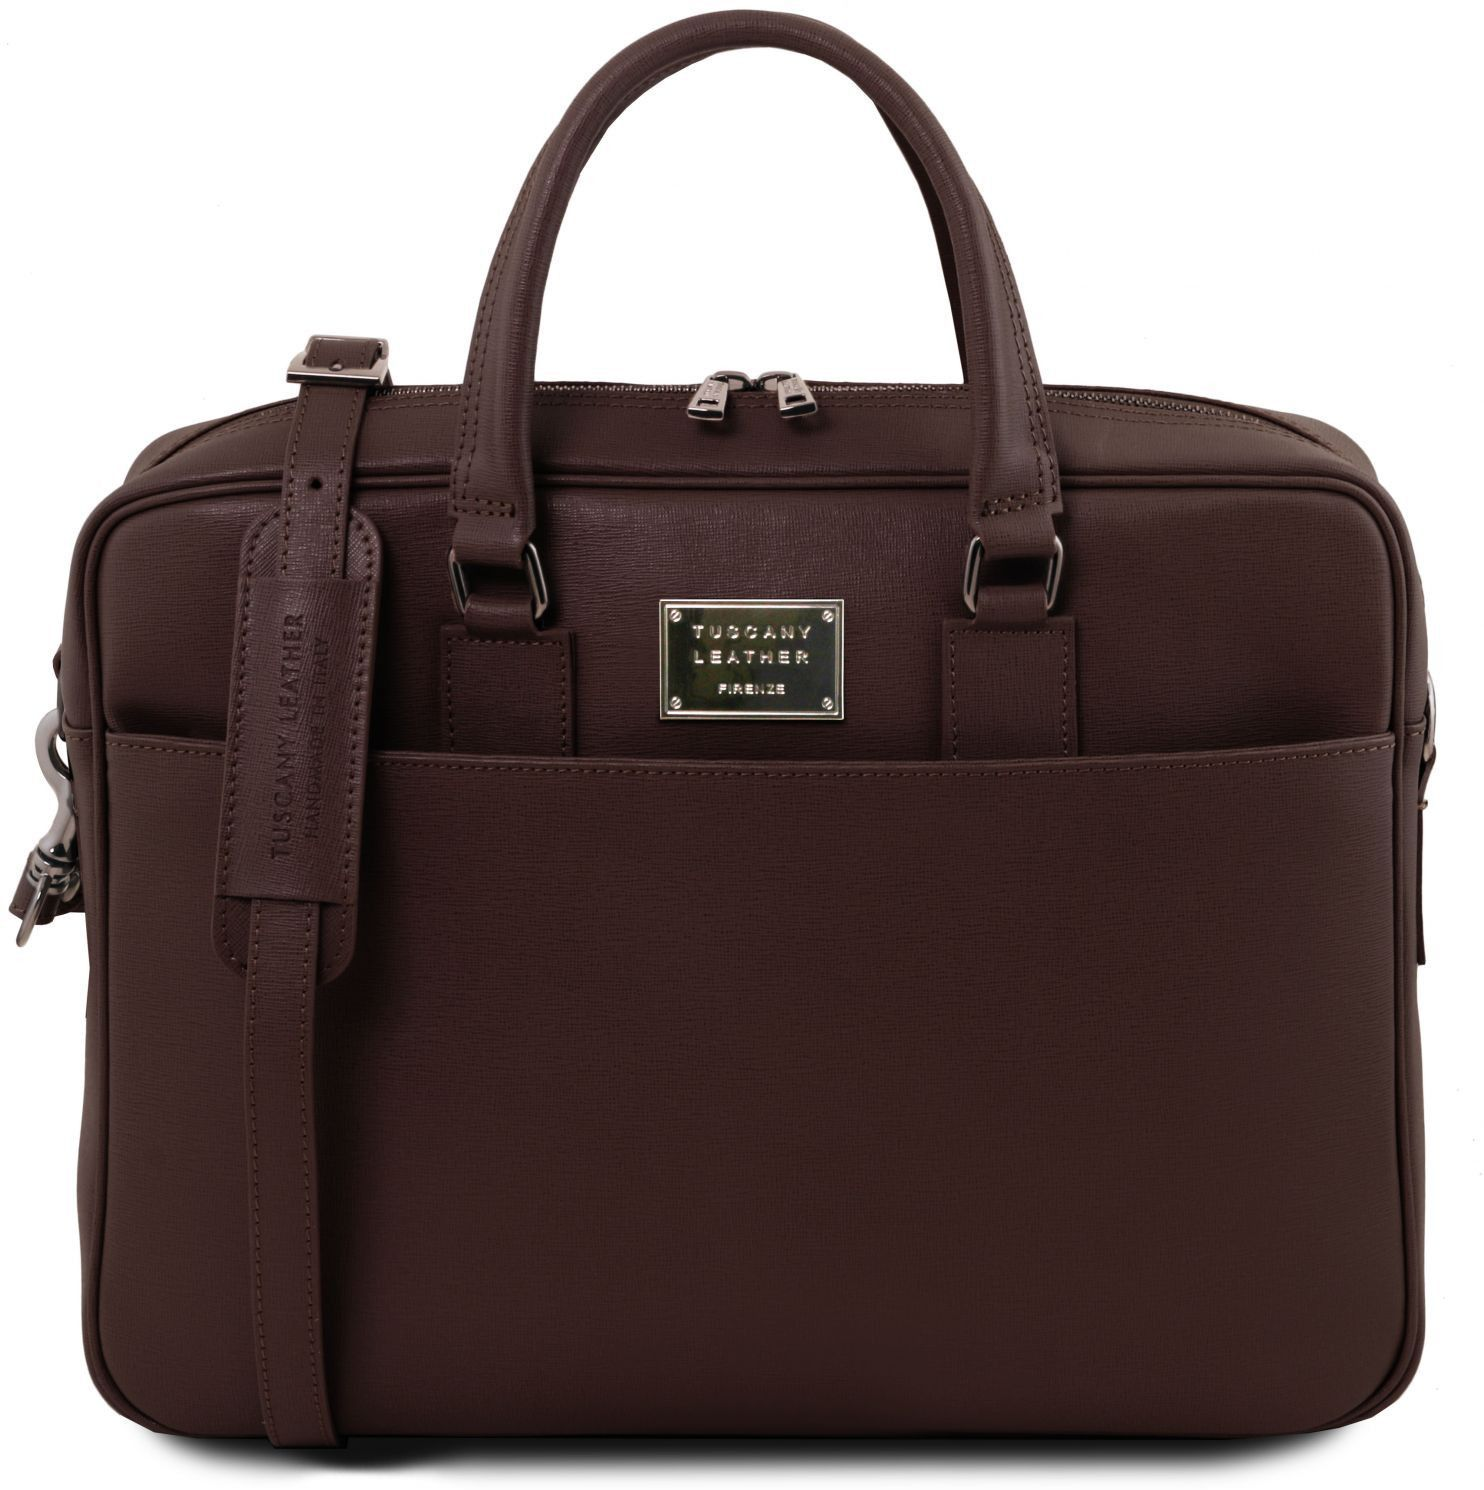 6277f17fbe Ανδρας    Χαρτοφύλακες    Τσάντα Laptop Δερμάτινη Urbino Καφέ σκούρο ...